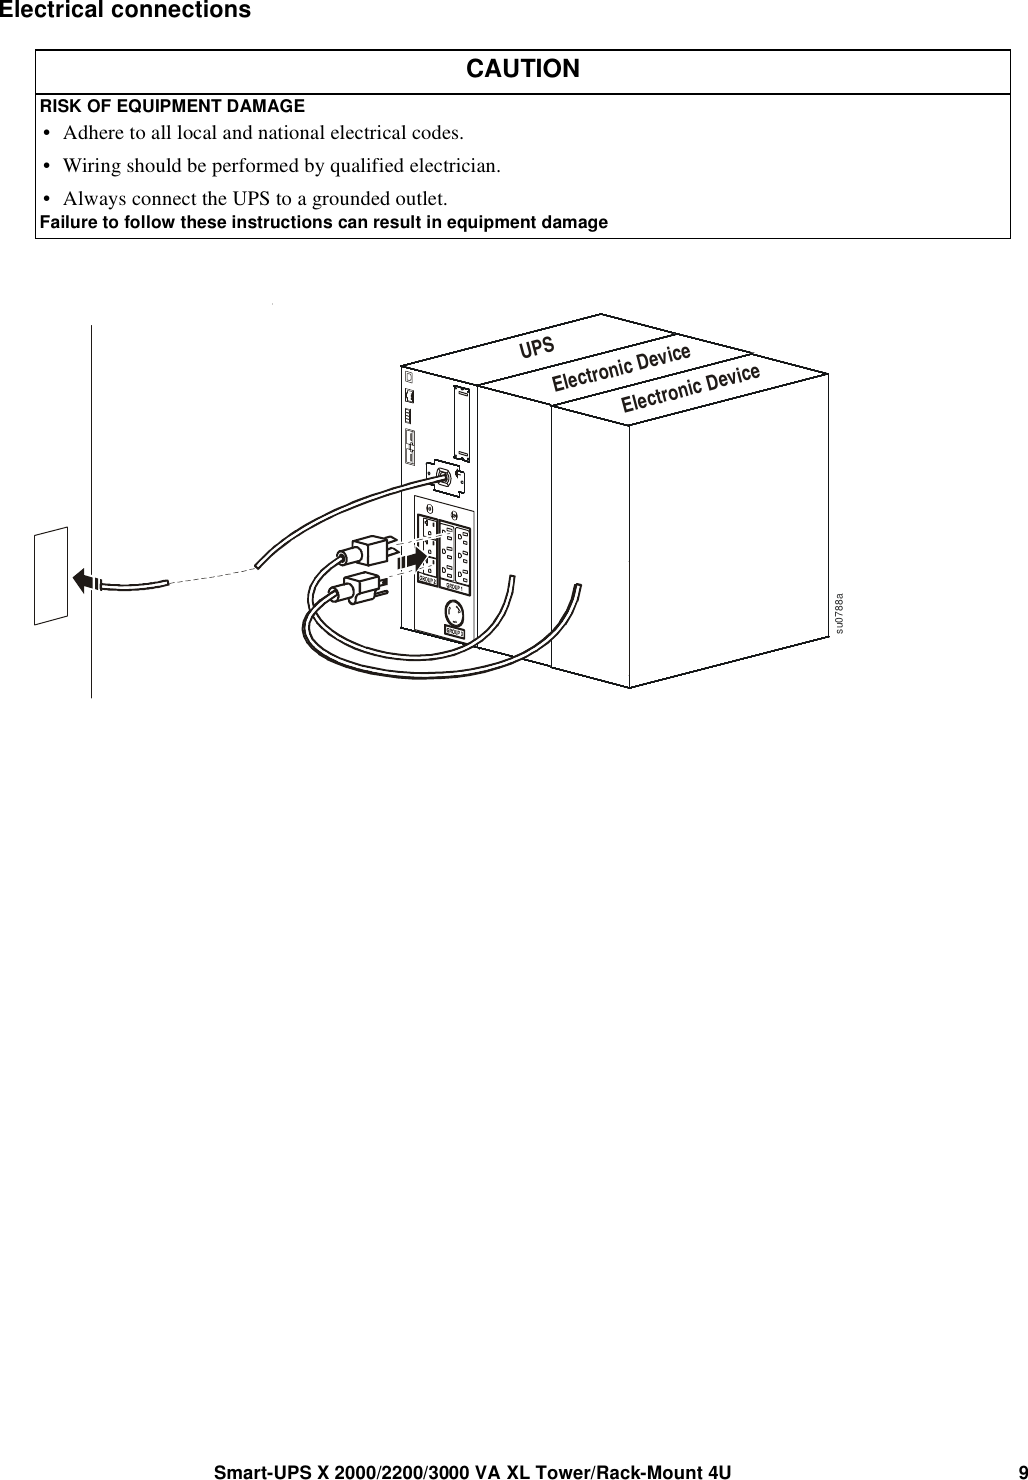 Apc Smart Ups 2200 Xl Users Manual SU IM 990 4651A 002 MN01 EN